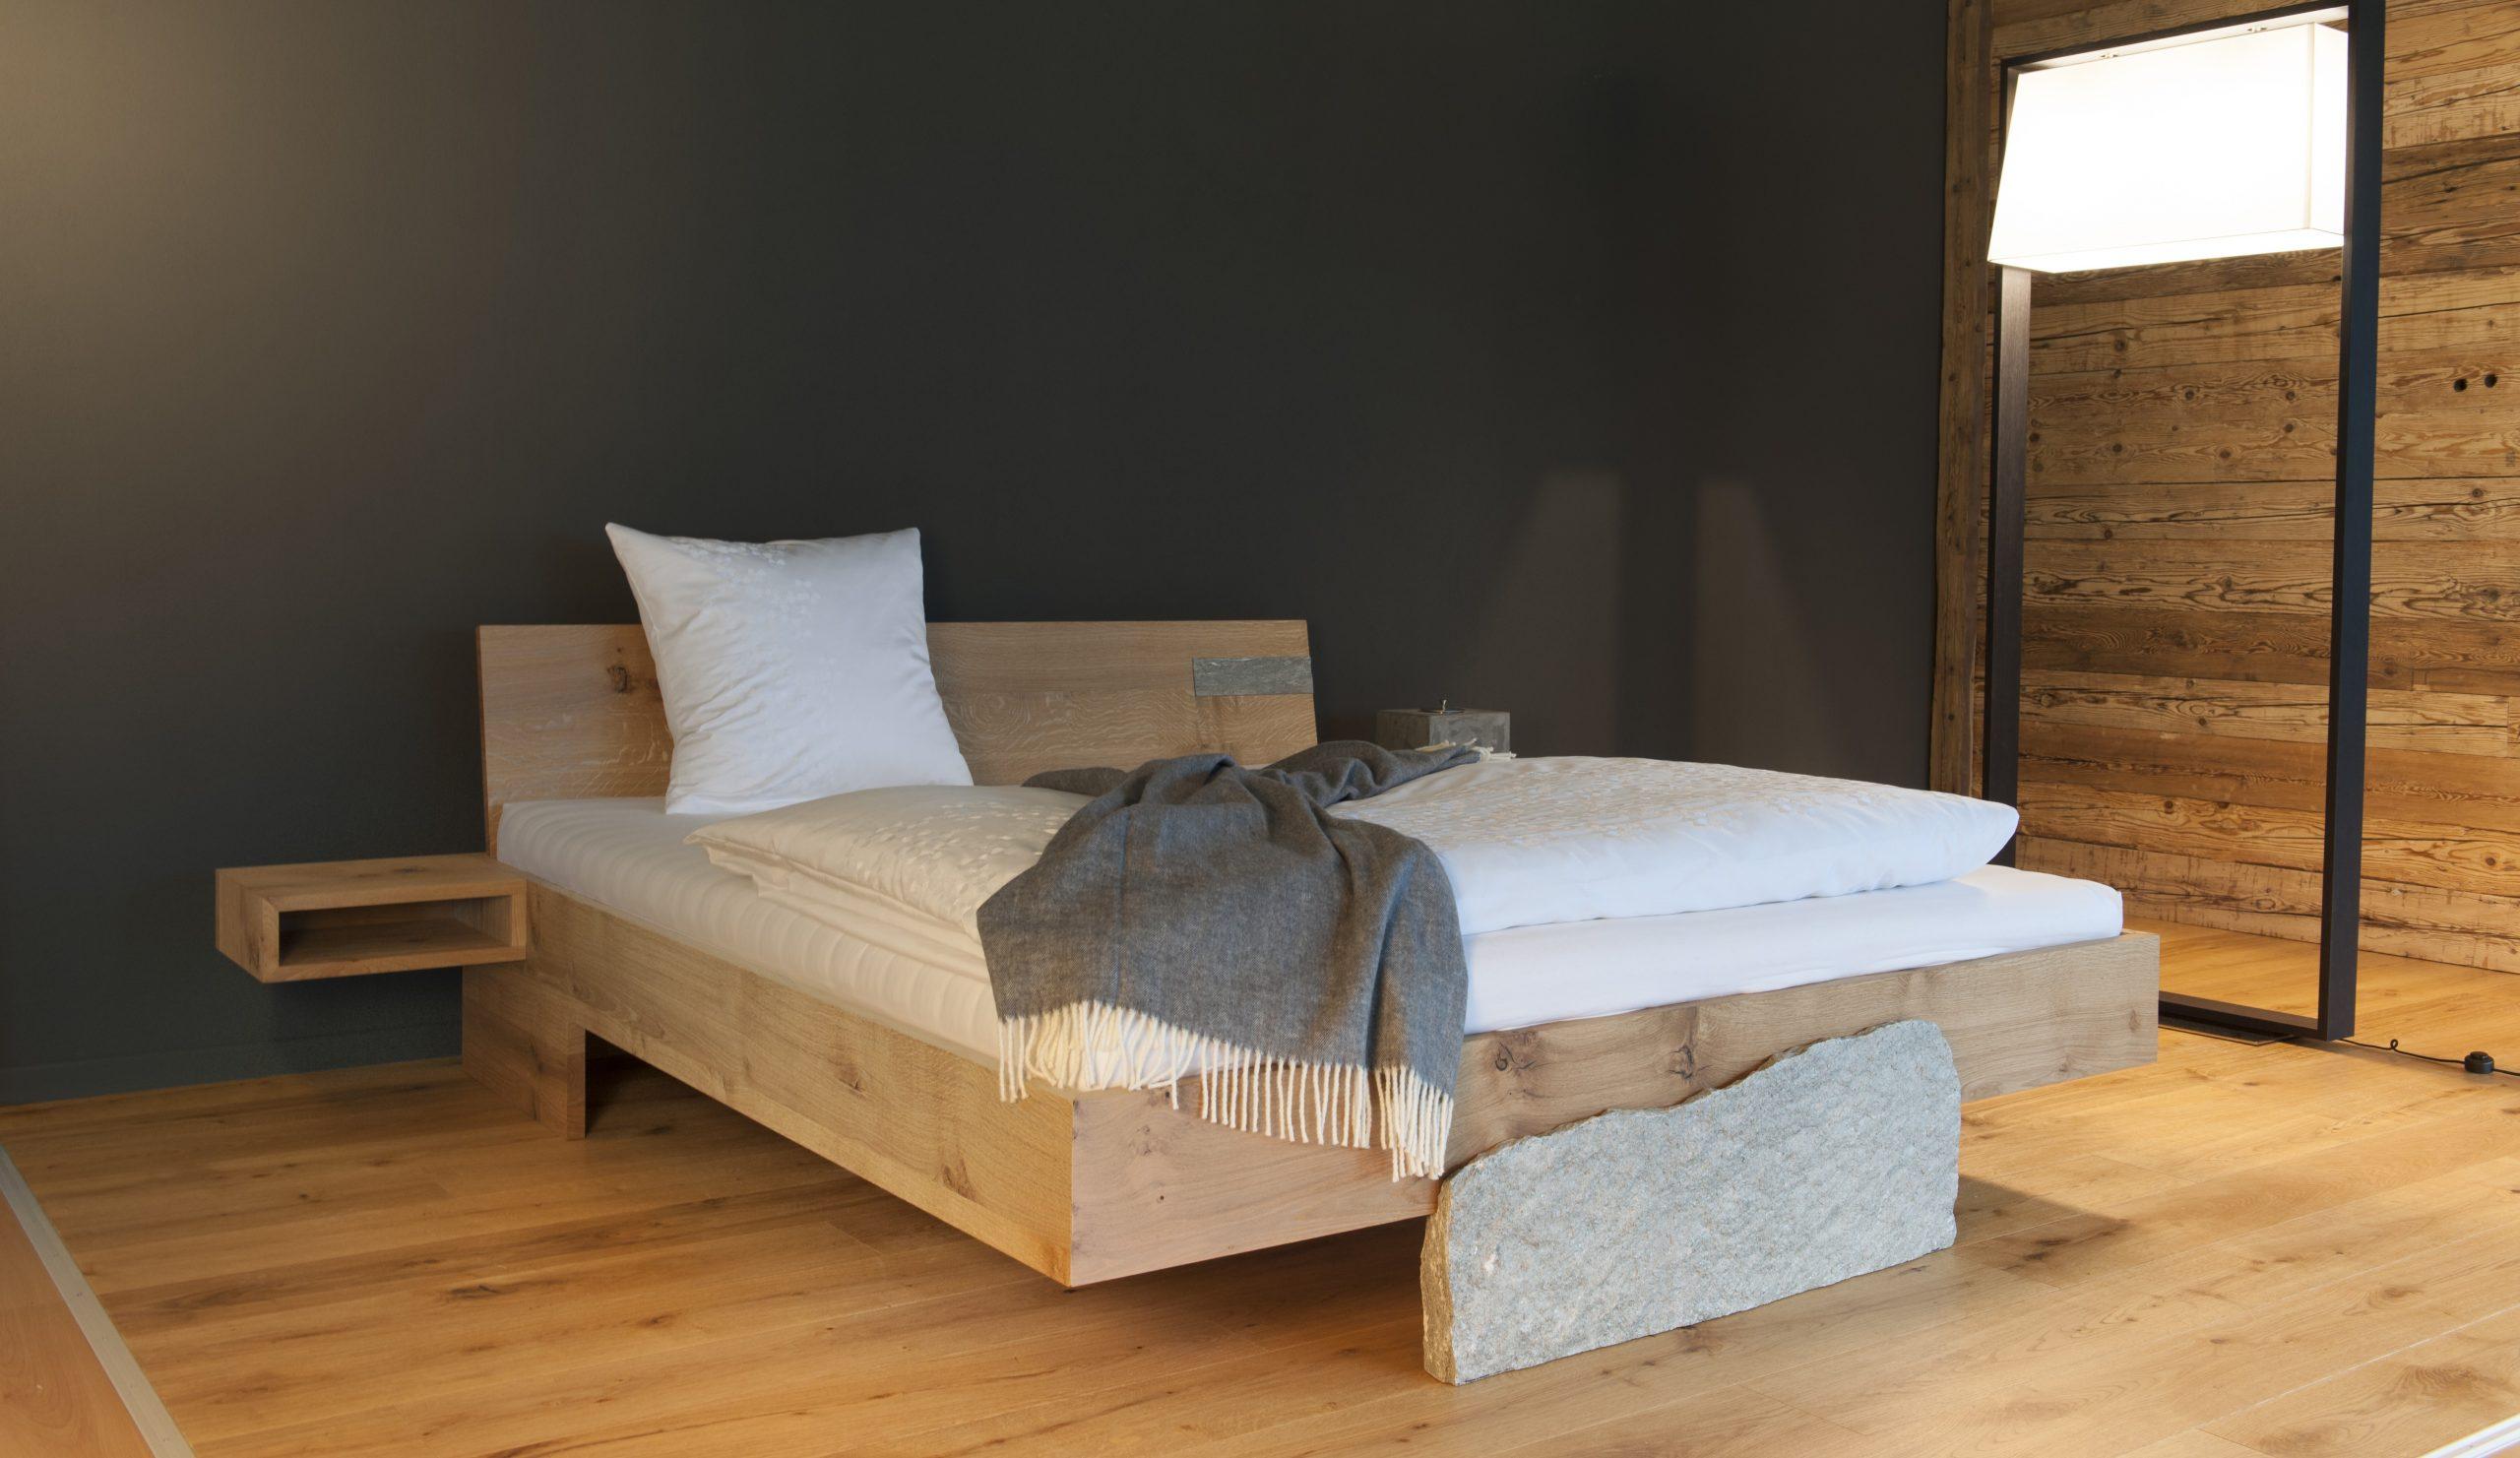 Full Size of Bett 200x200 Komforthöhe Massiv 180x200 Somnus Betten Poco Cars Antike Günstig Kaufen Ebay Topper Weiß 90x190 Lifetime Designer Bett Bett Rückwand